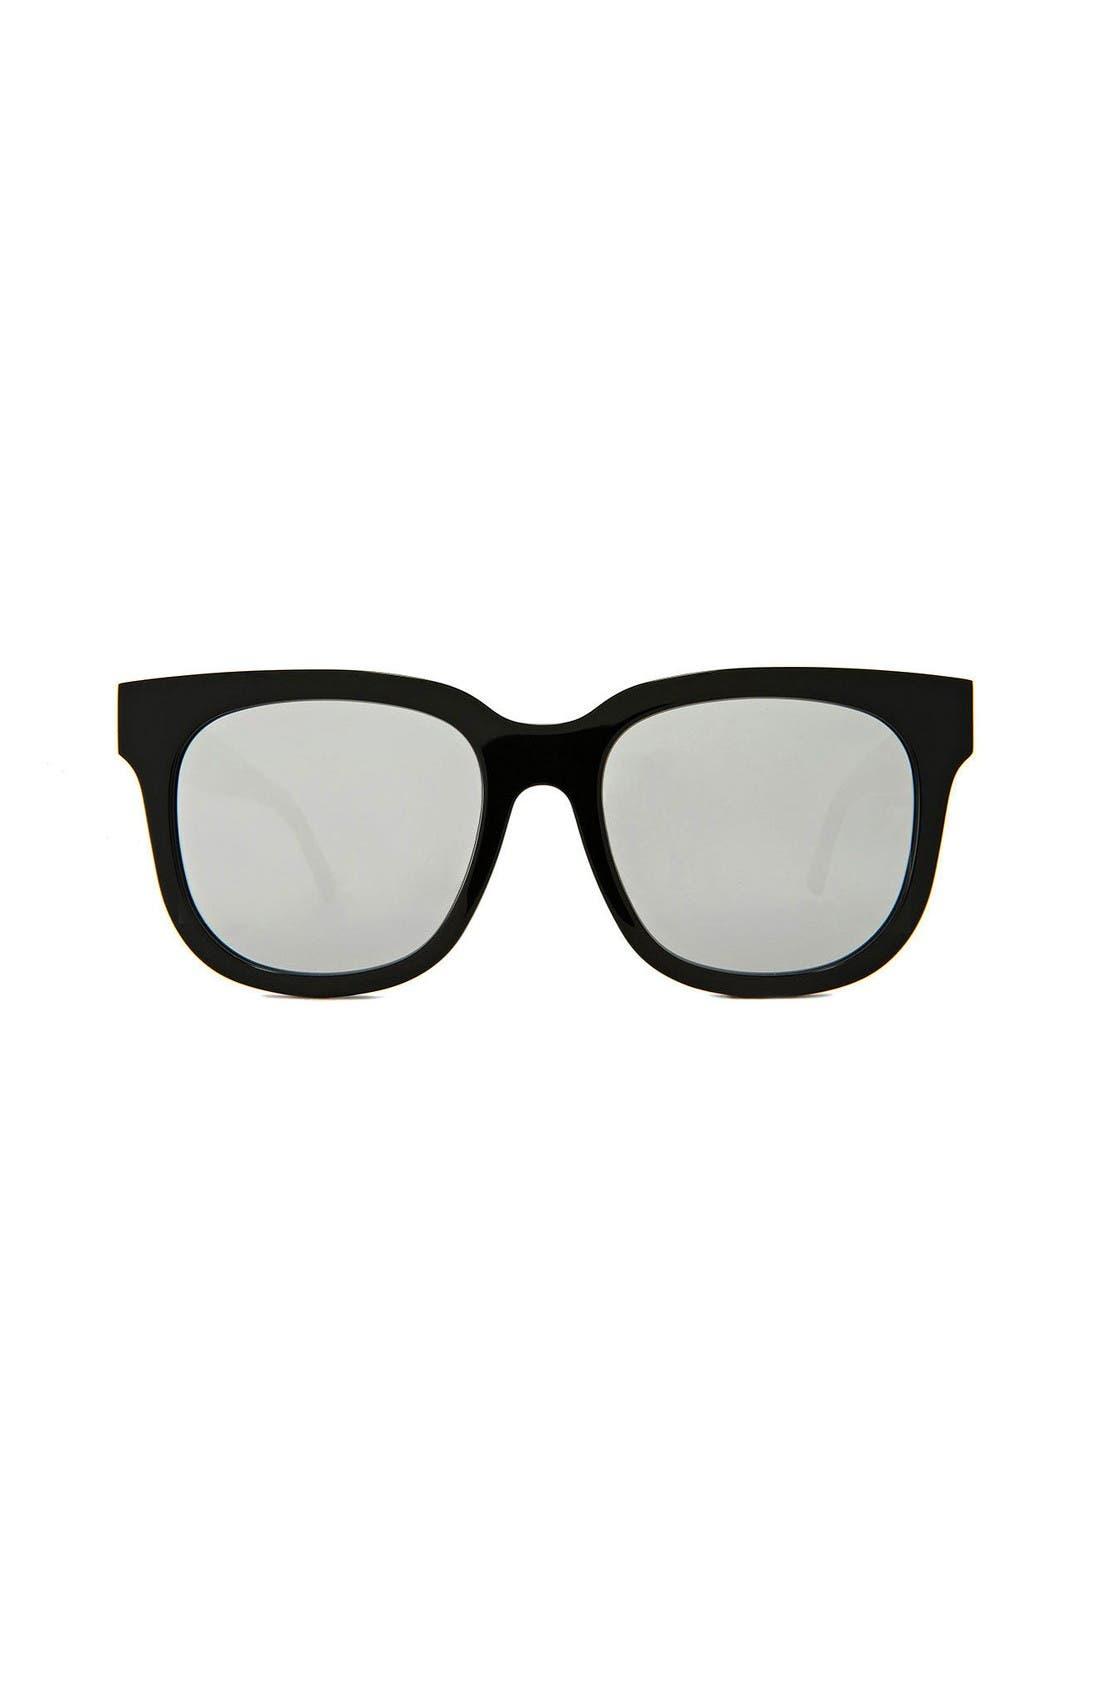 Main Image - Gentle Monster Didi D 56mm Square Sunglasses